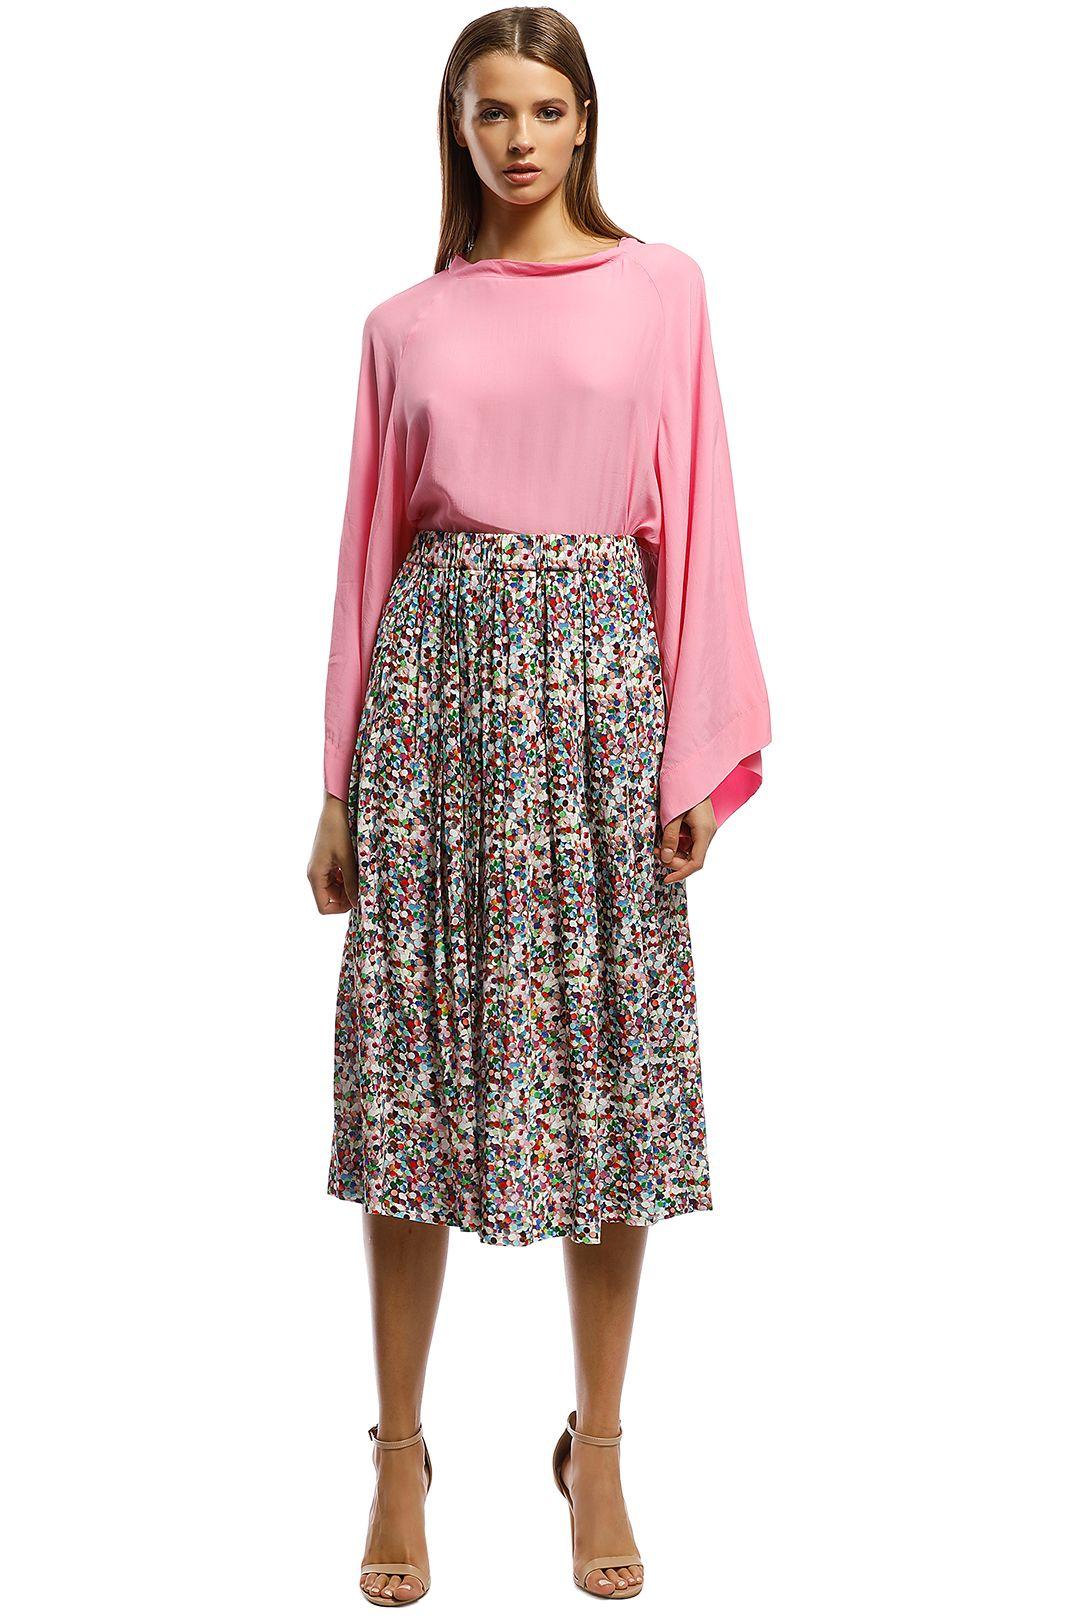 Gorman - Razzle Dazzle Skirt - Print - Front